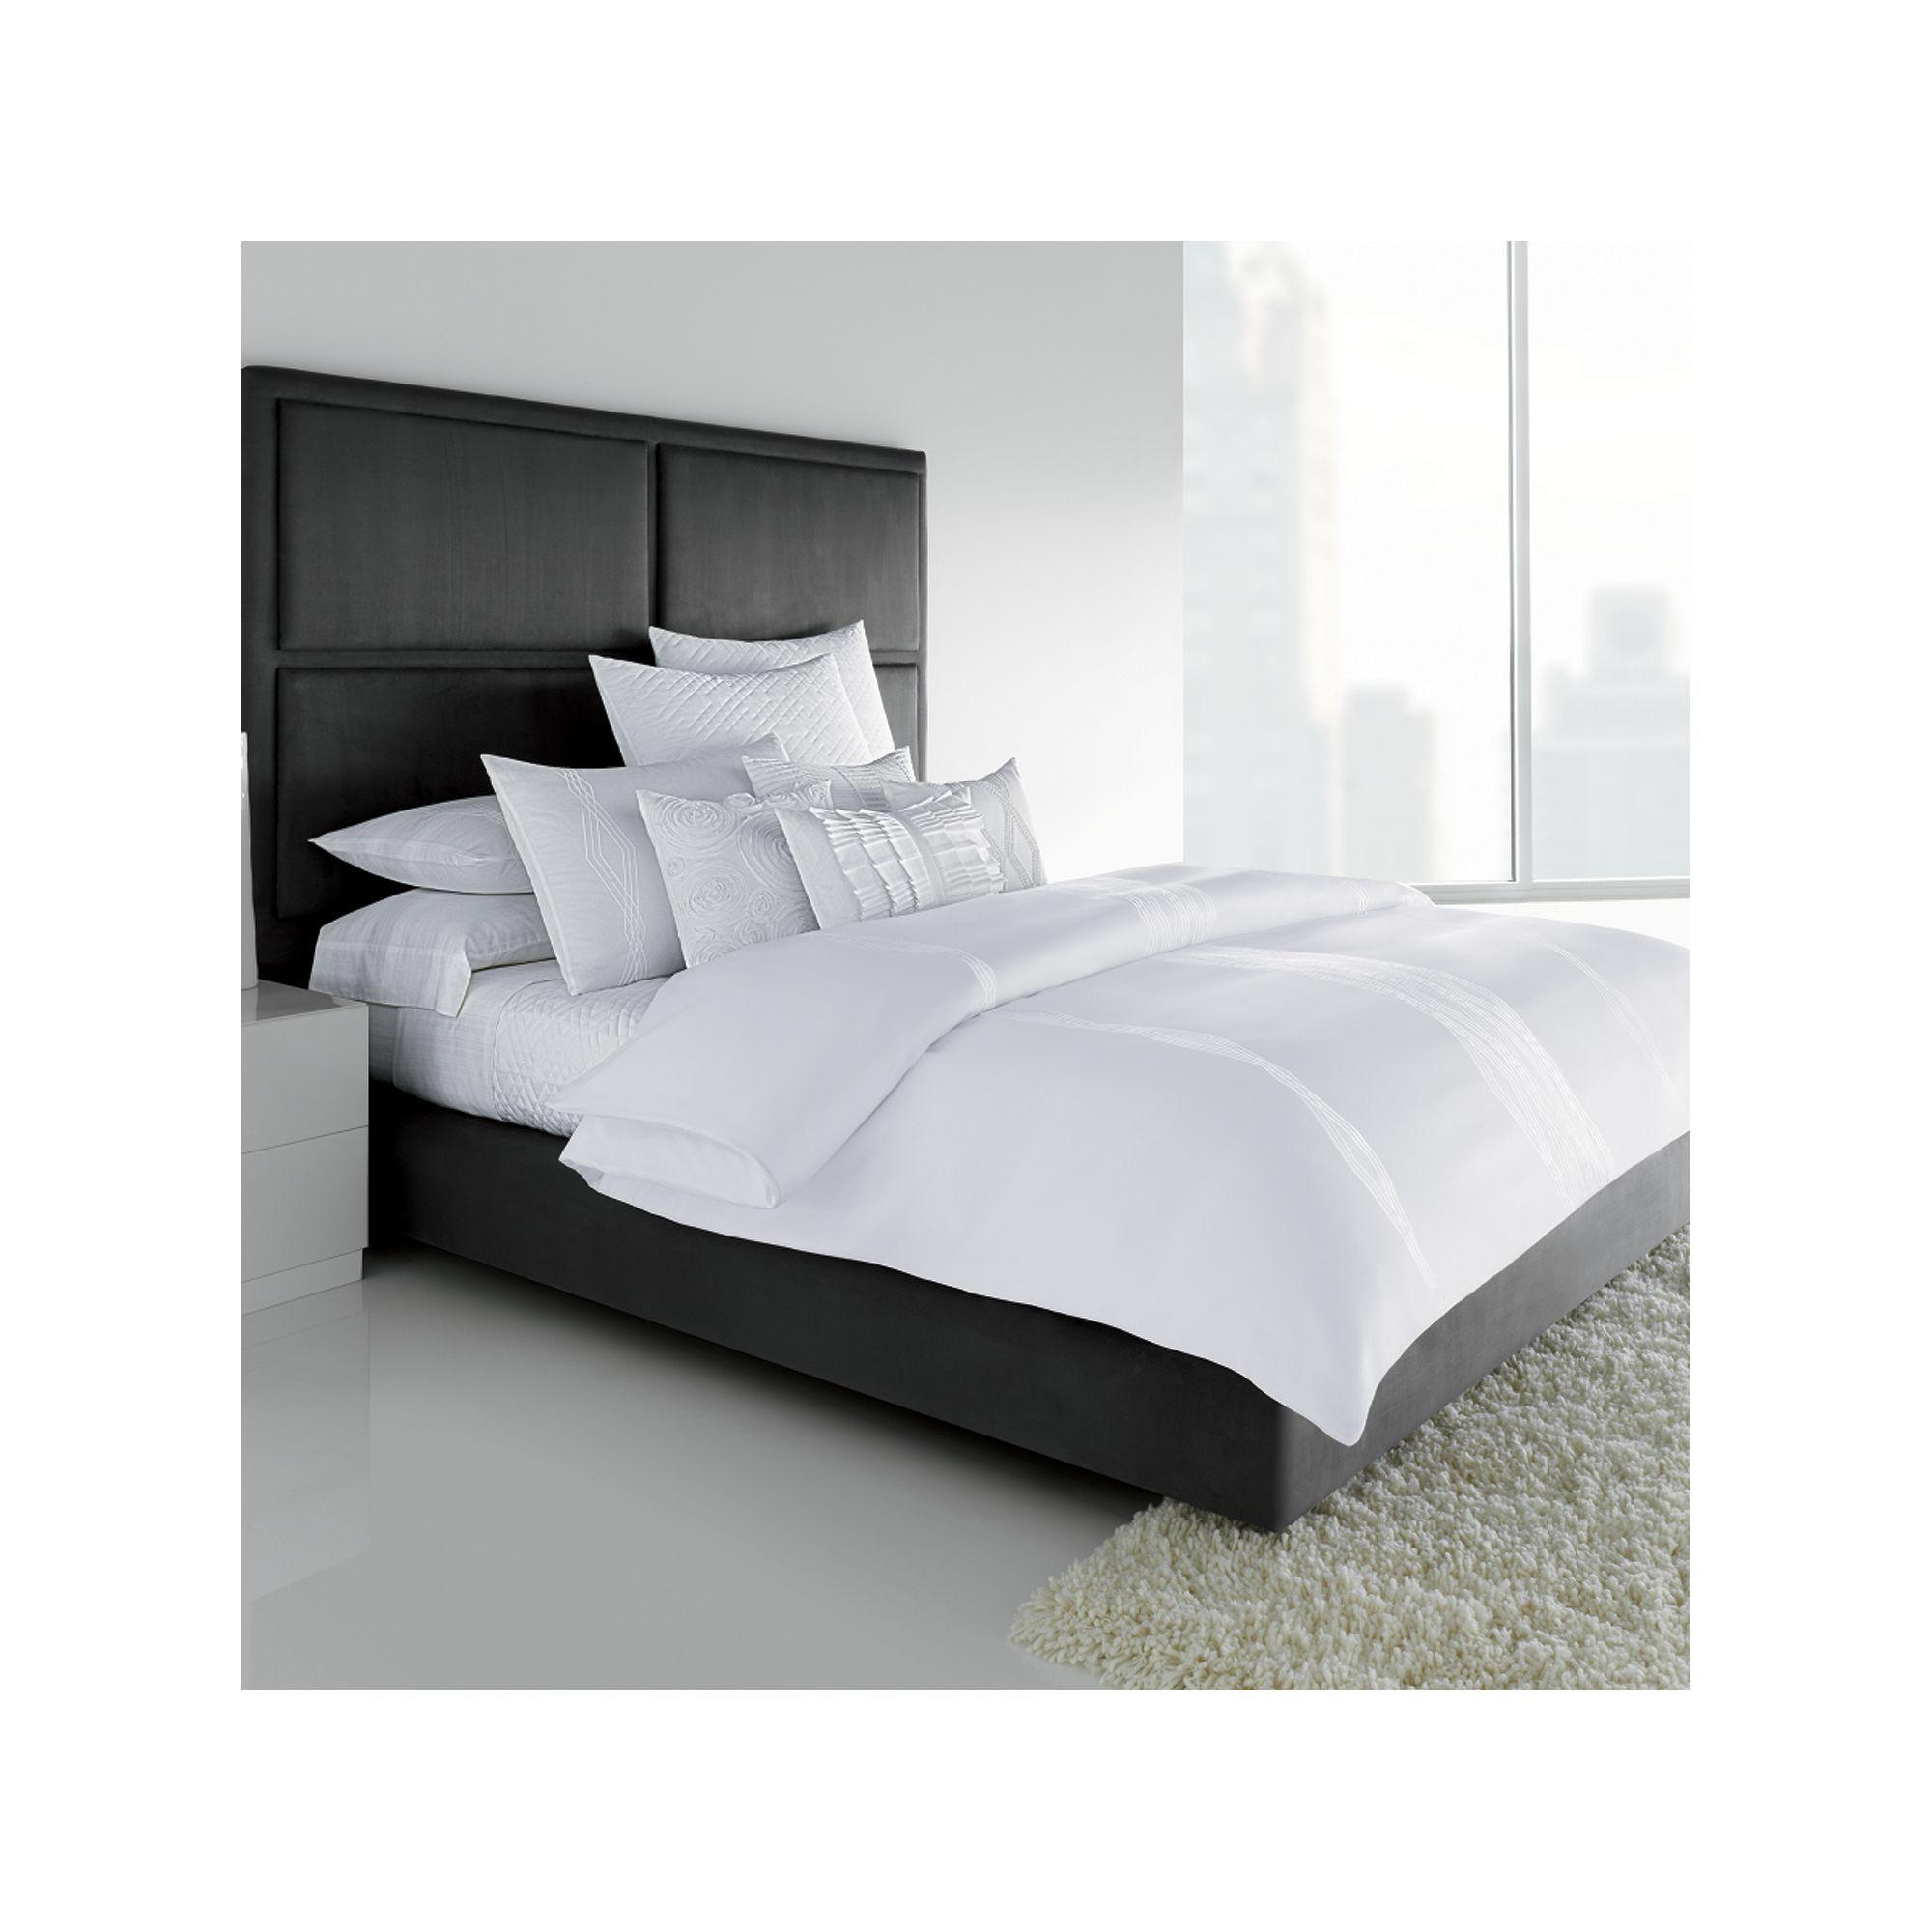 Simply Vera Vera Wang Tranquility 4 Pc Comforter Set Comforter